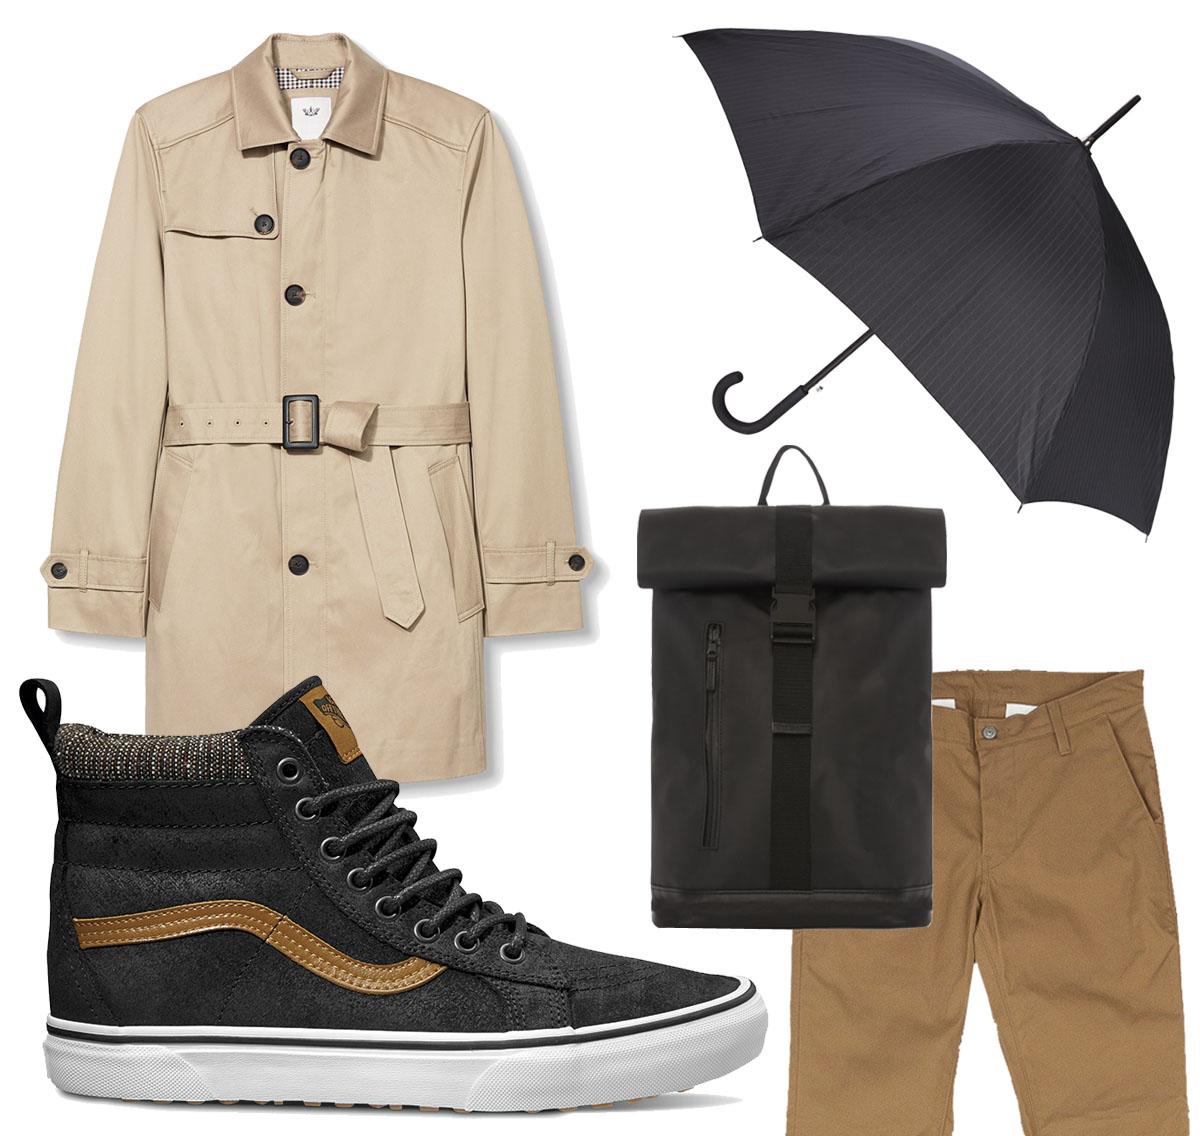 tetu-shopping-mode-pluie-vans-levis-primark-esprit